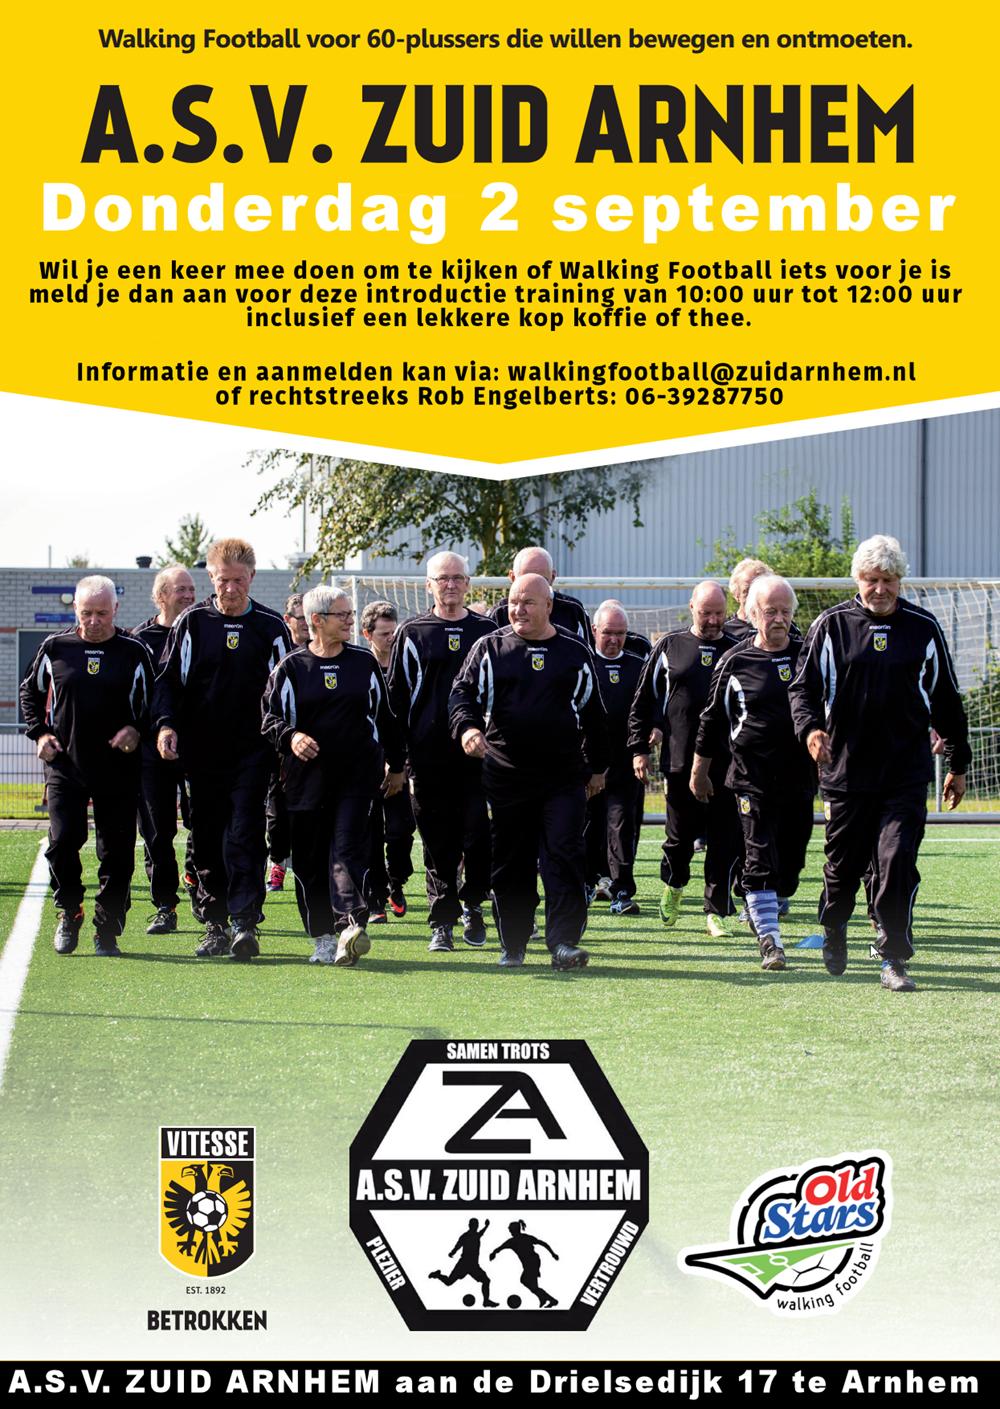 Vitesse_Oldstars_Walking_Football_A5..pspimage_FH.png